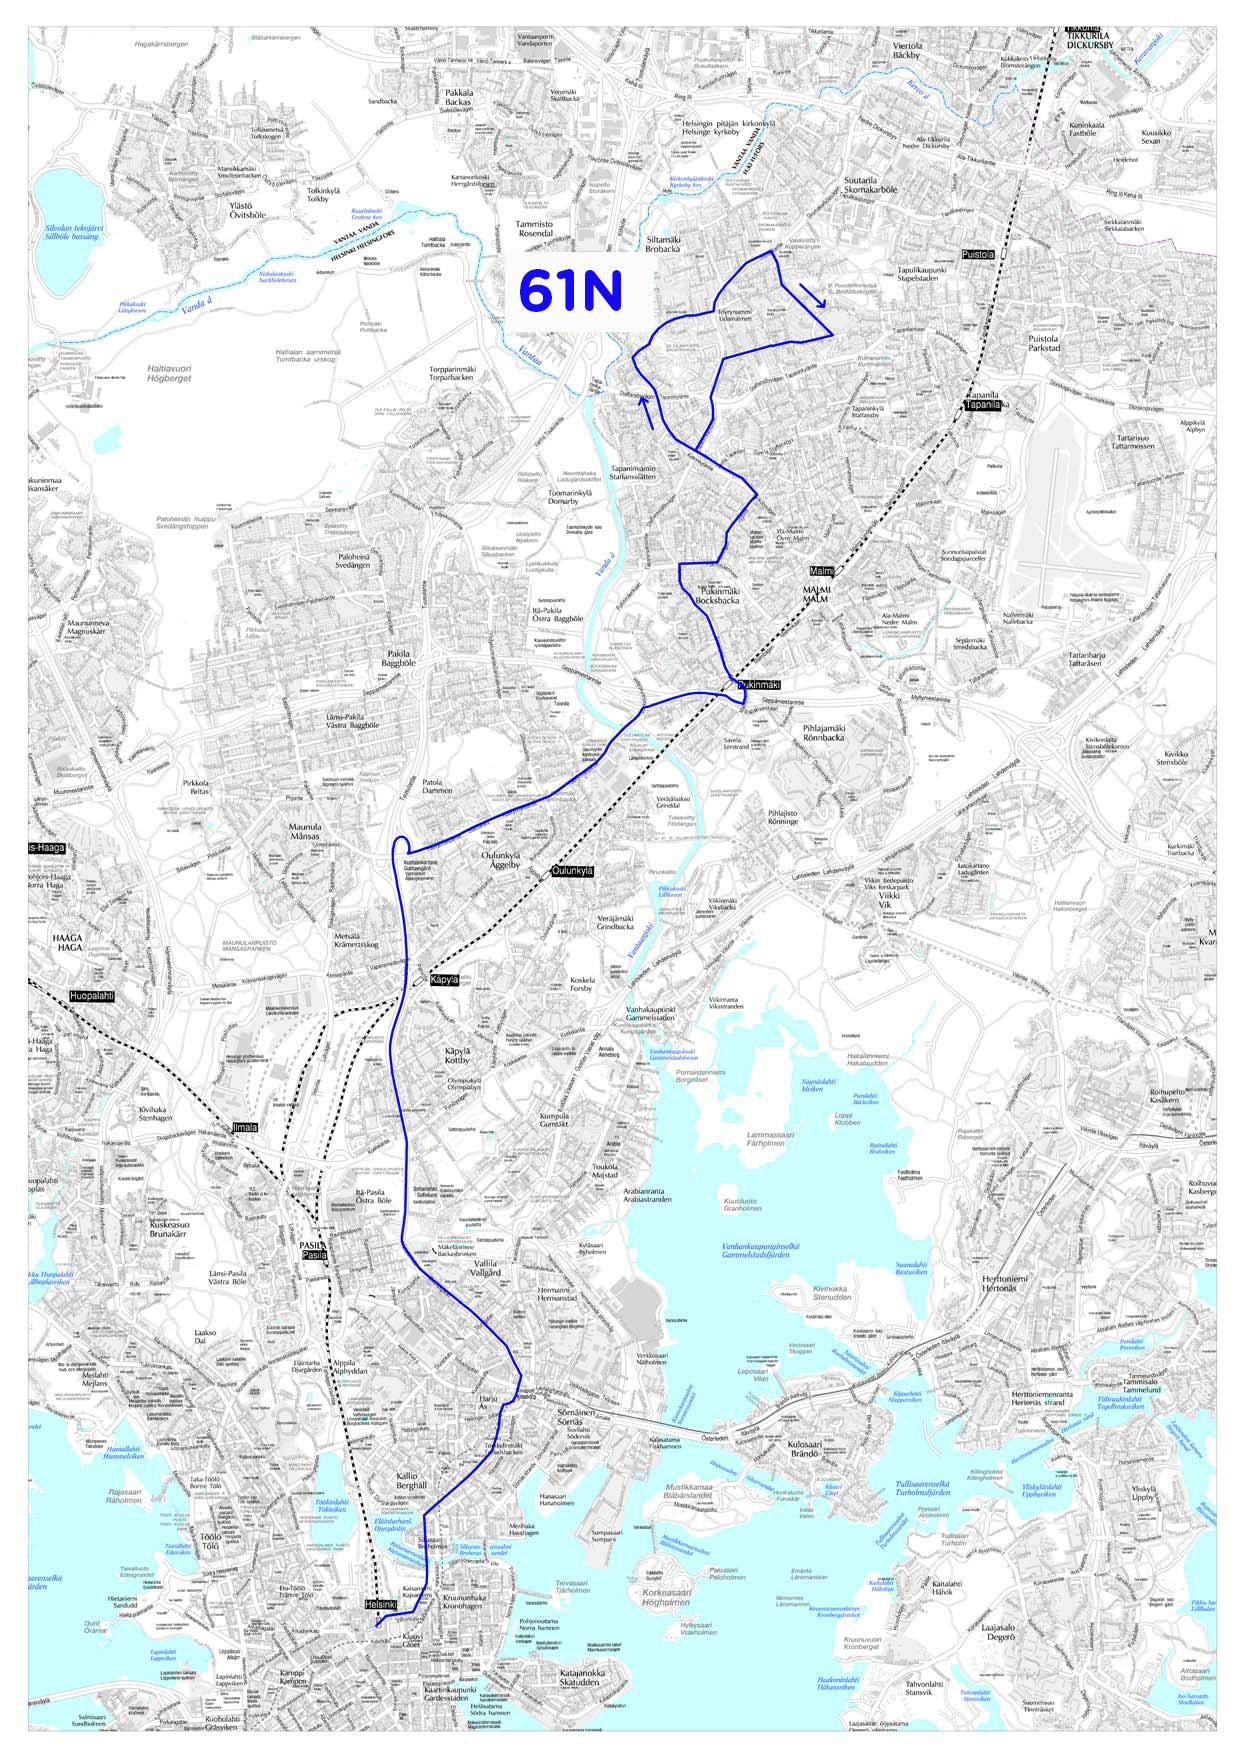 Yölinjan 61N reitti 14.8.2017 alkaen